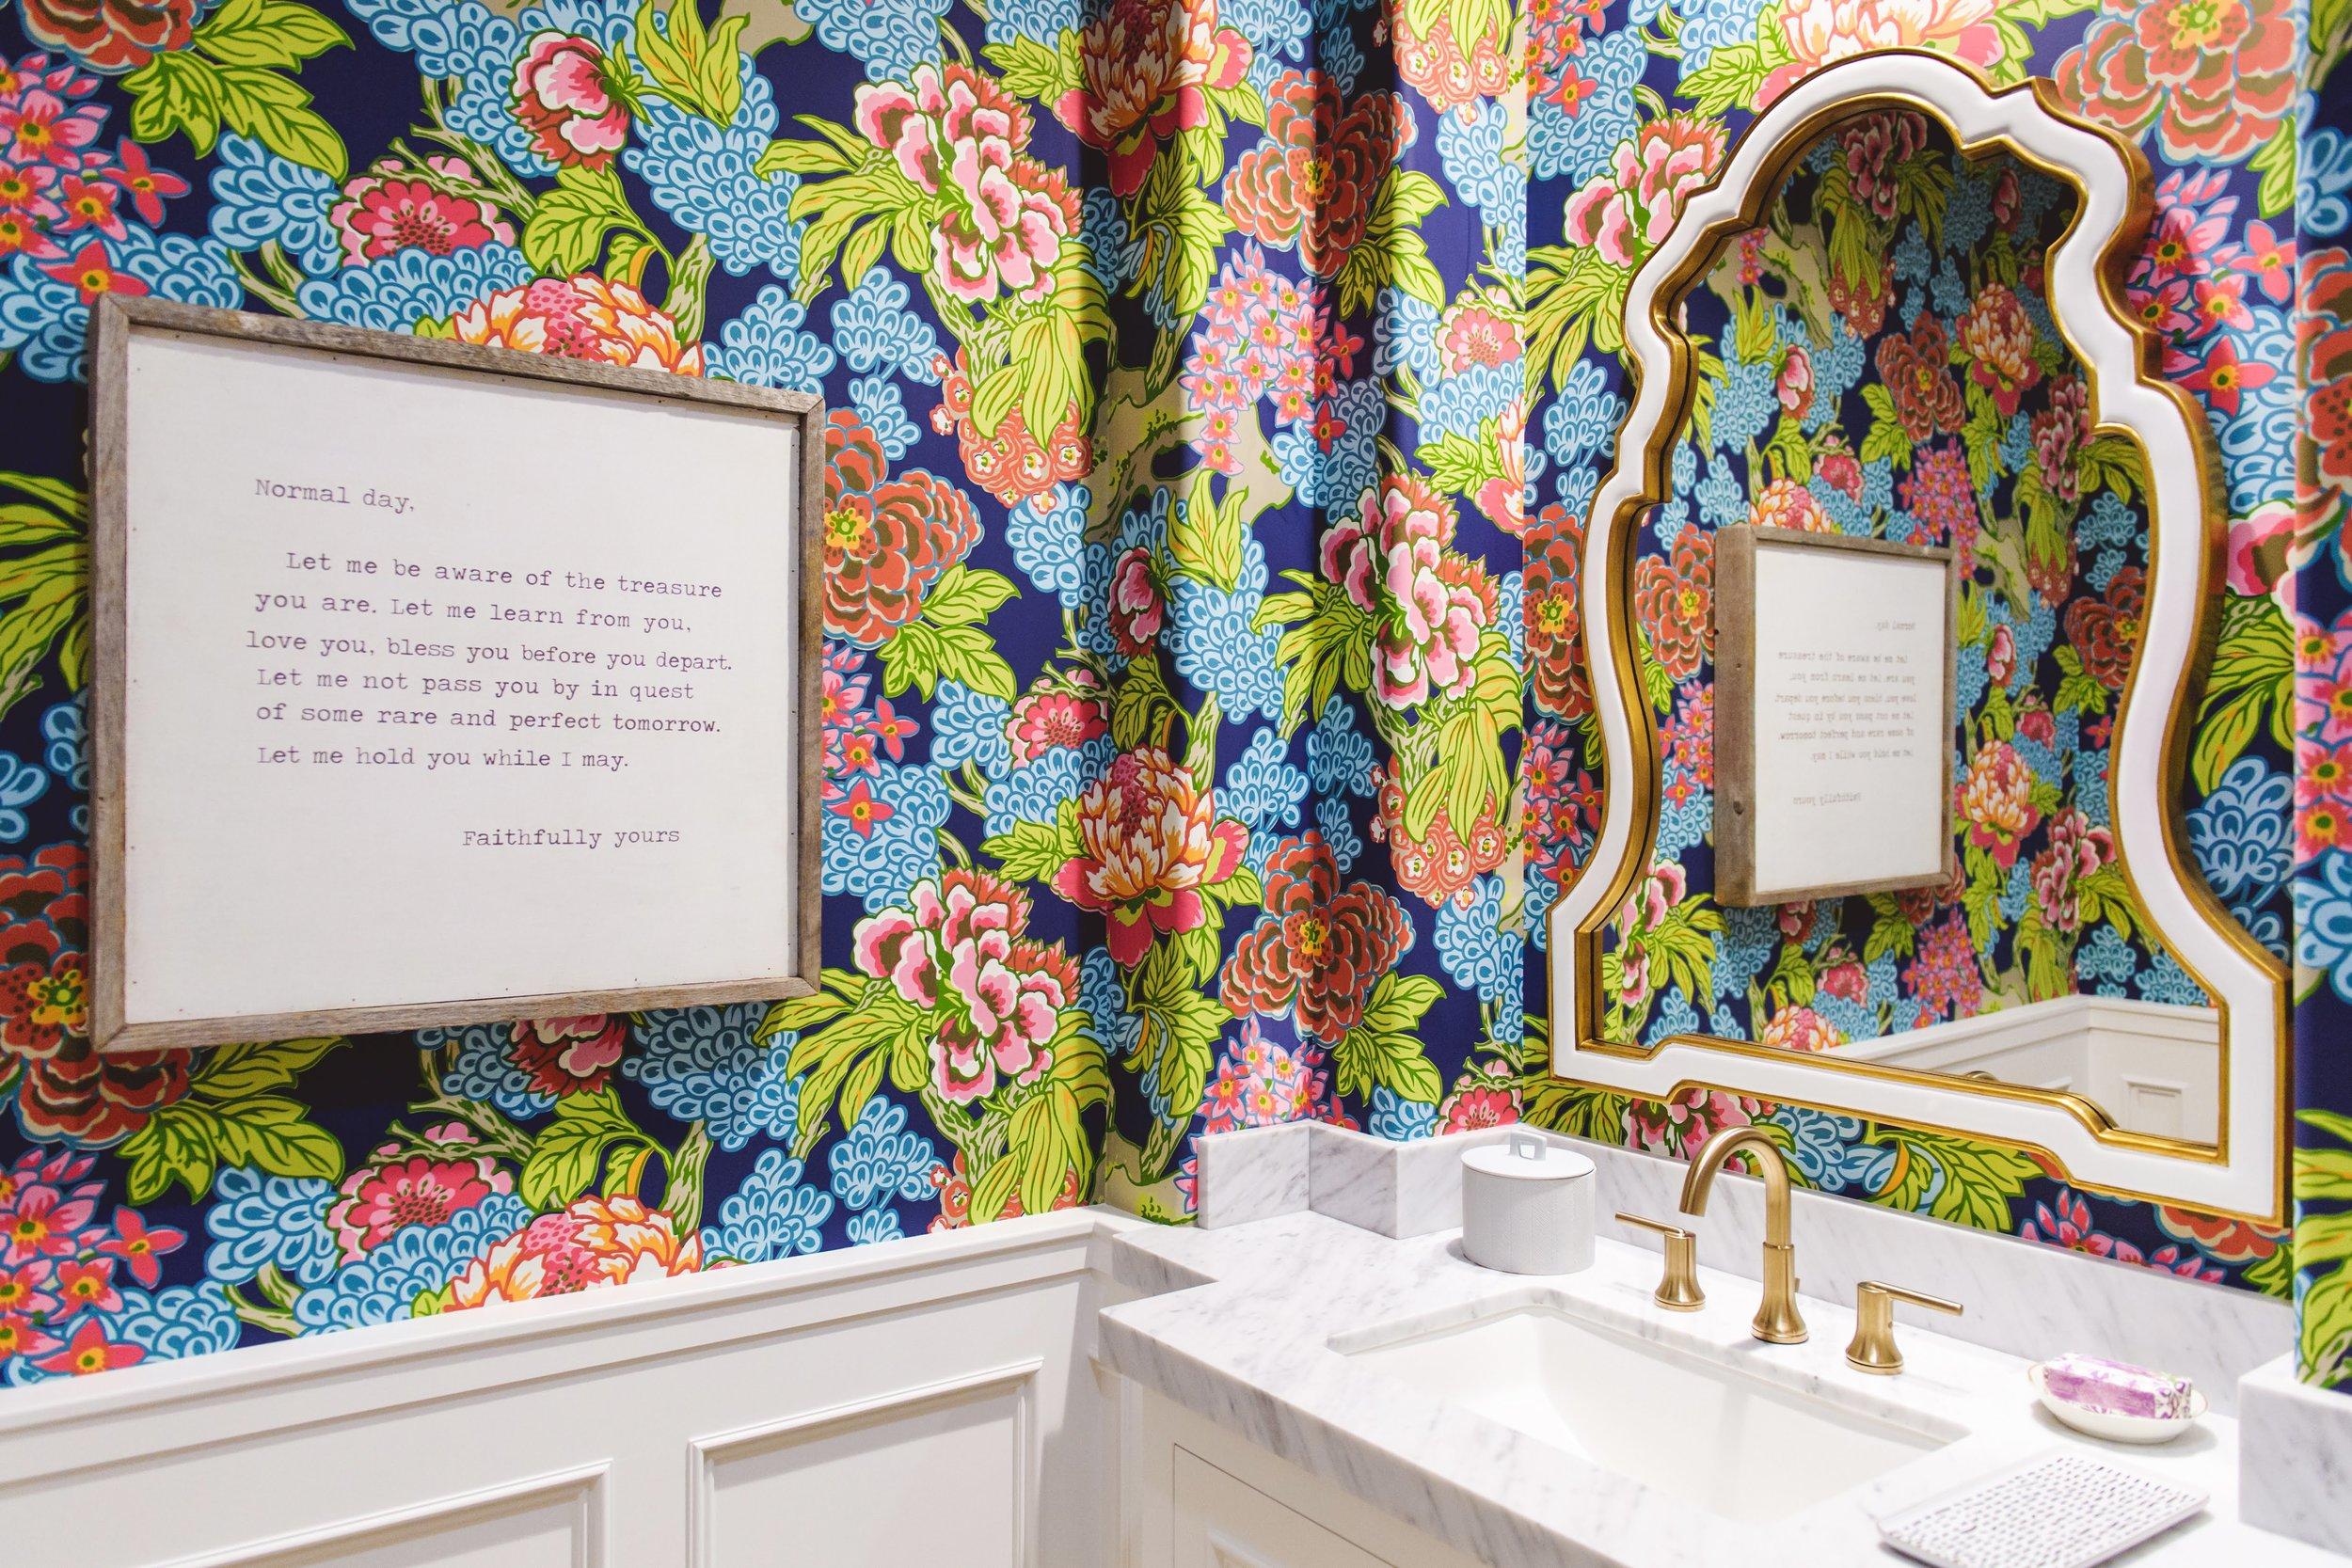 savvy {holly leaf} hall bathroom-0001 2.jpg